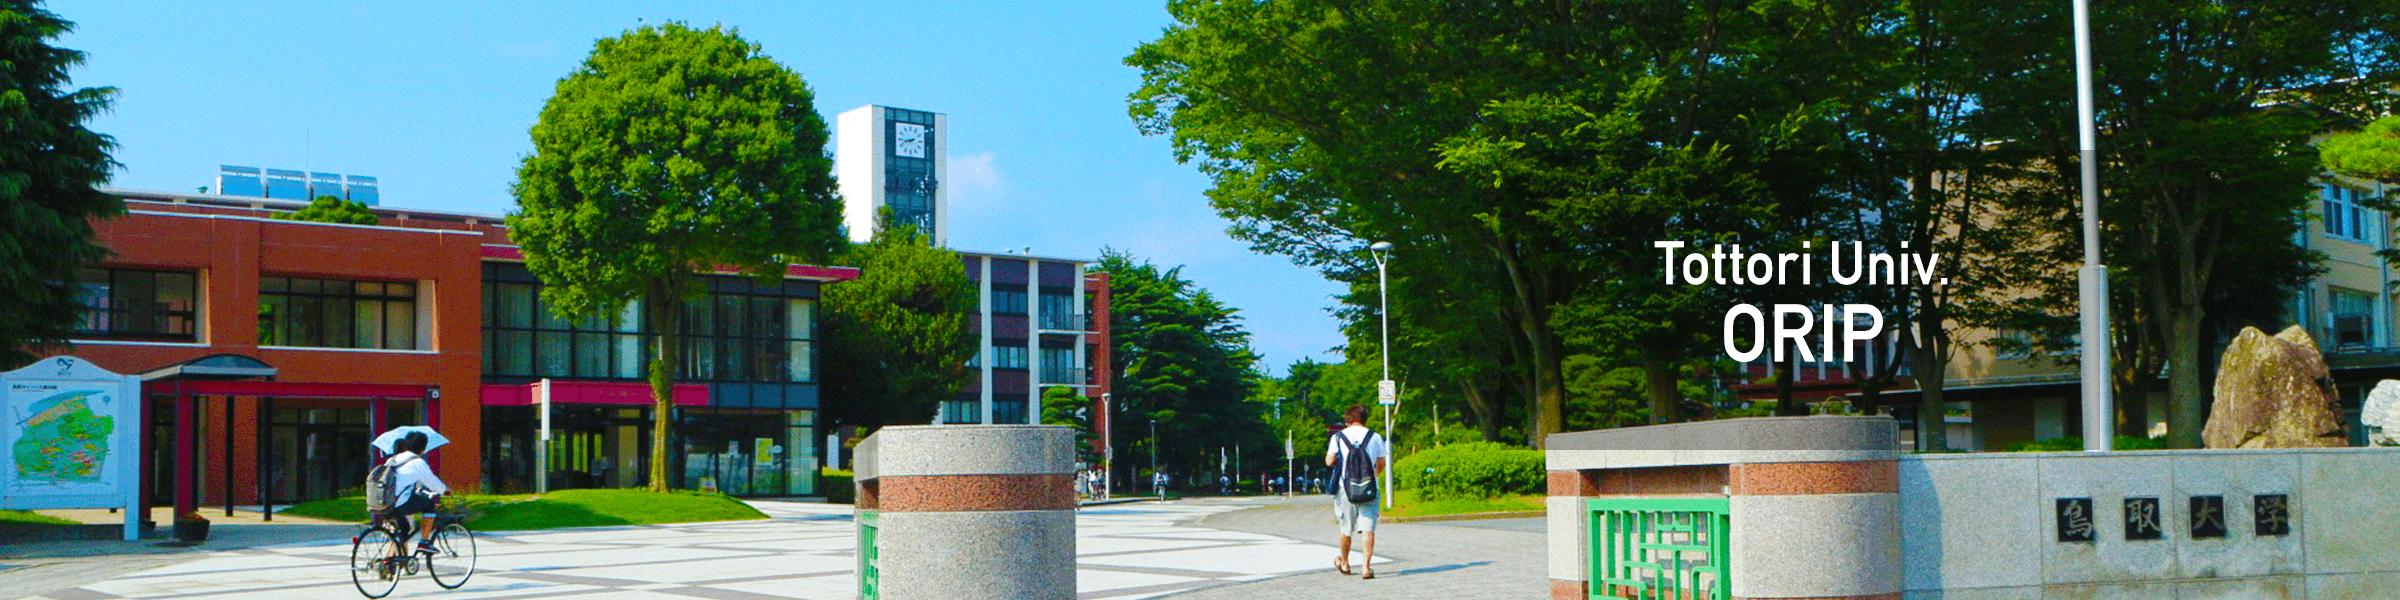 Organization for Research Initiative and Promotion 鳥取大学研究推進機構